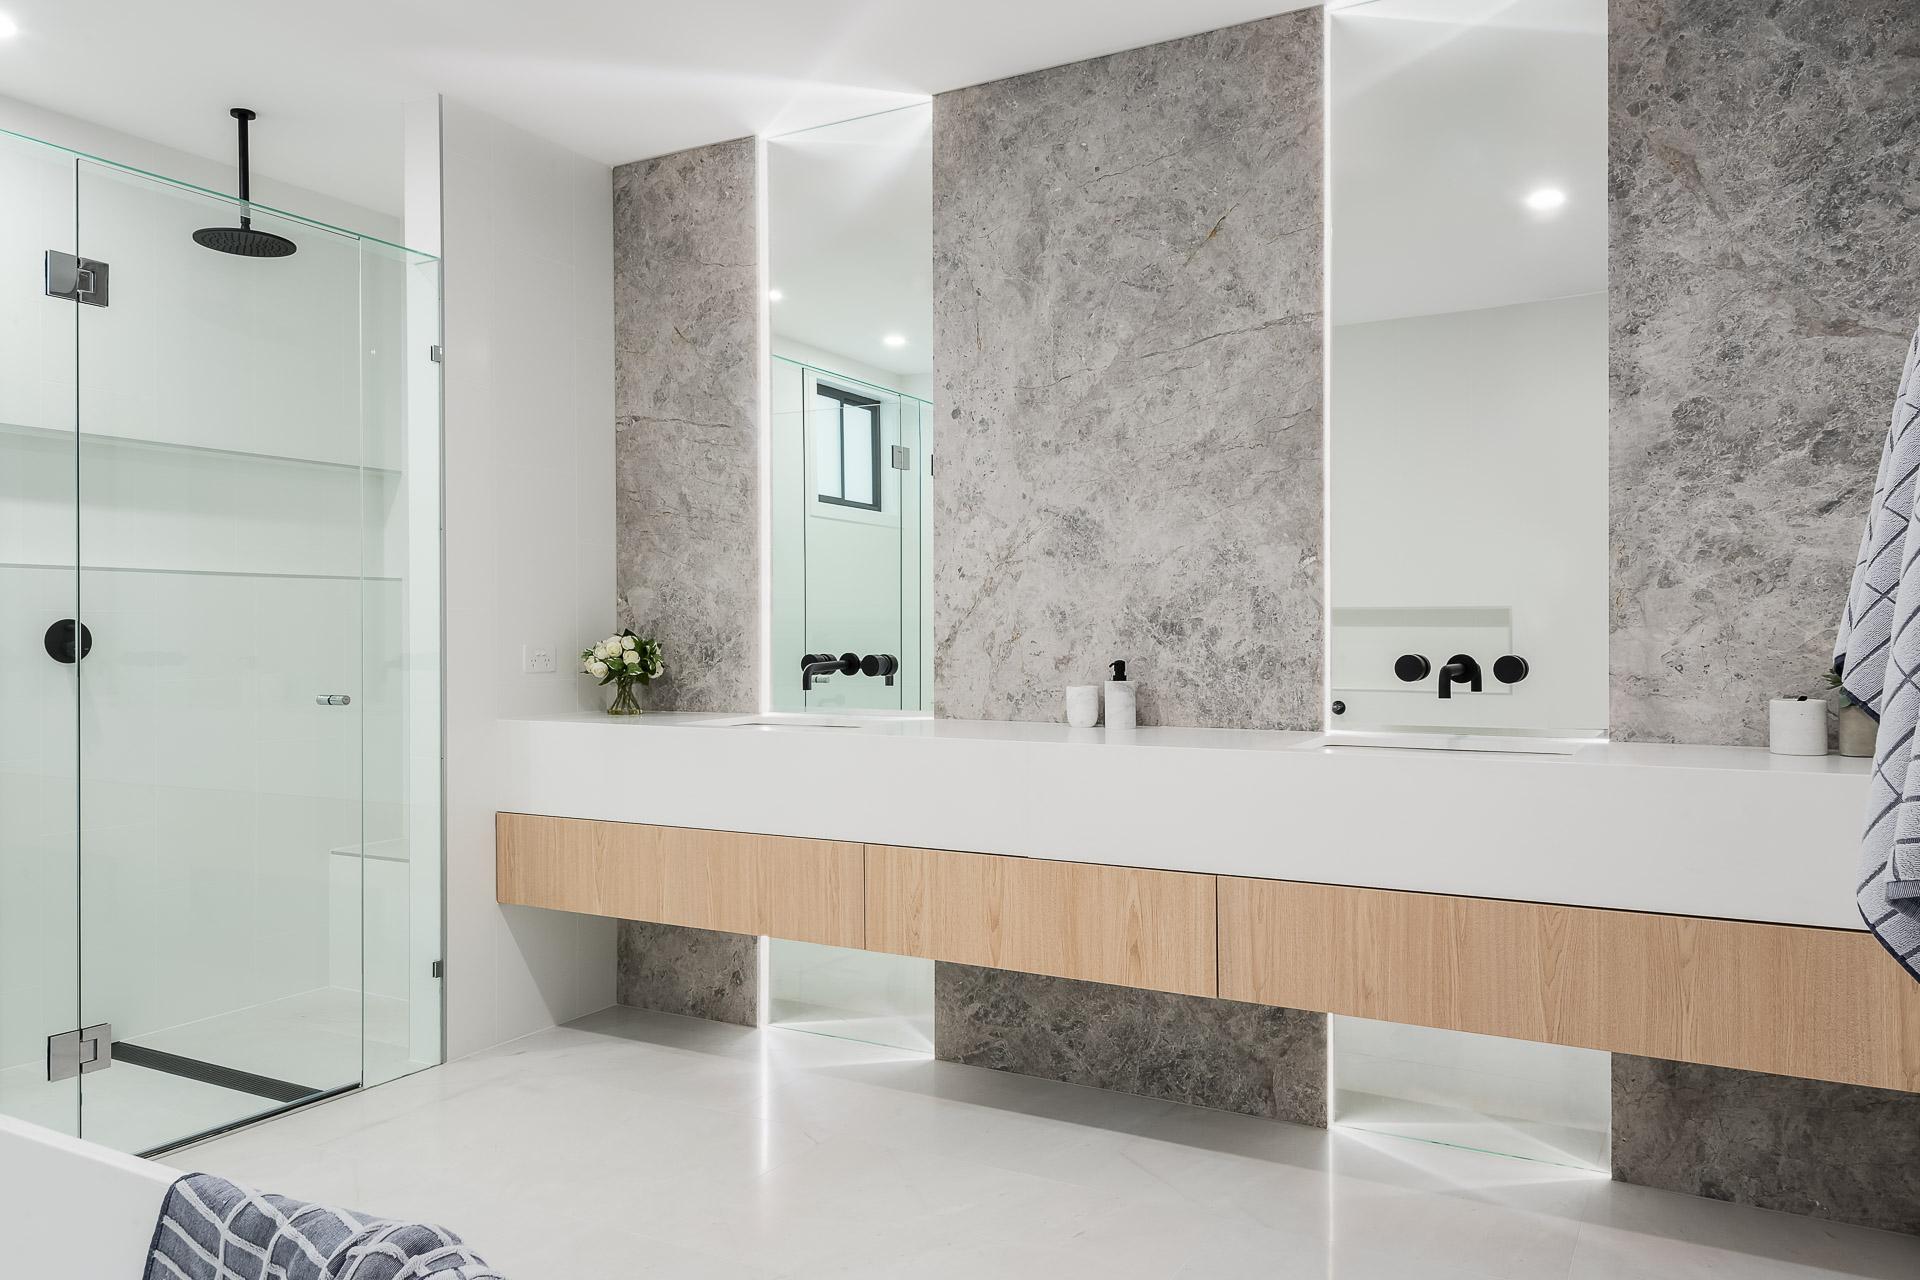 Bathroom-Gilgandra-St-17.jpg